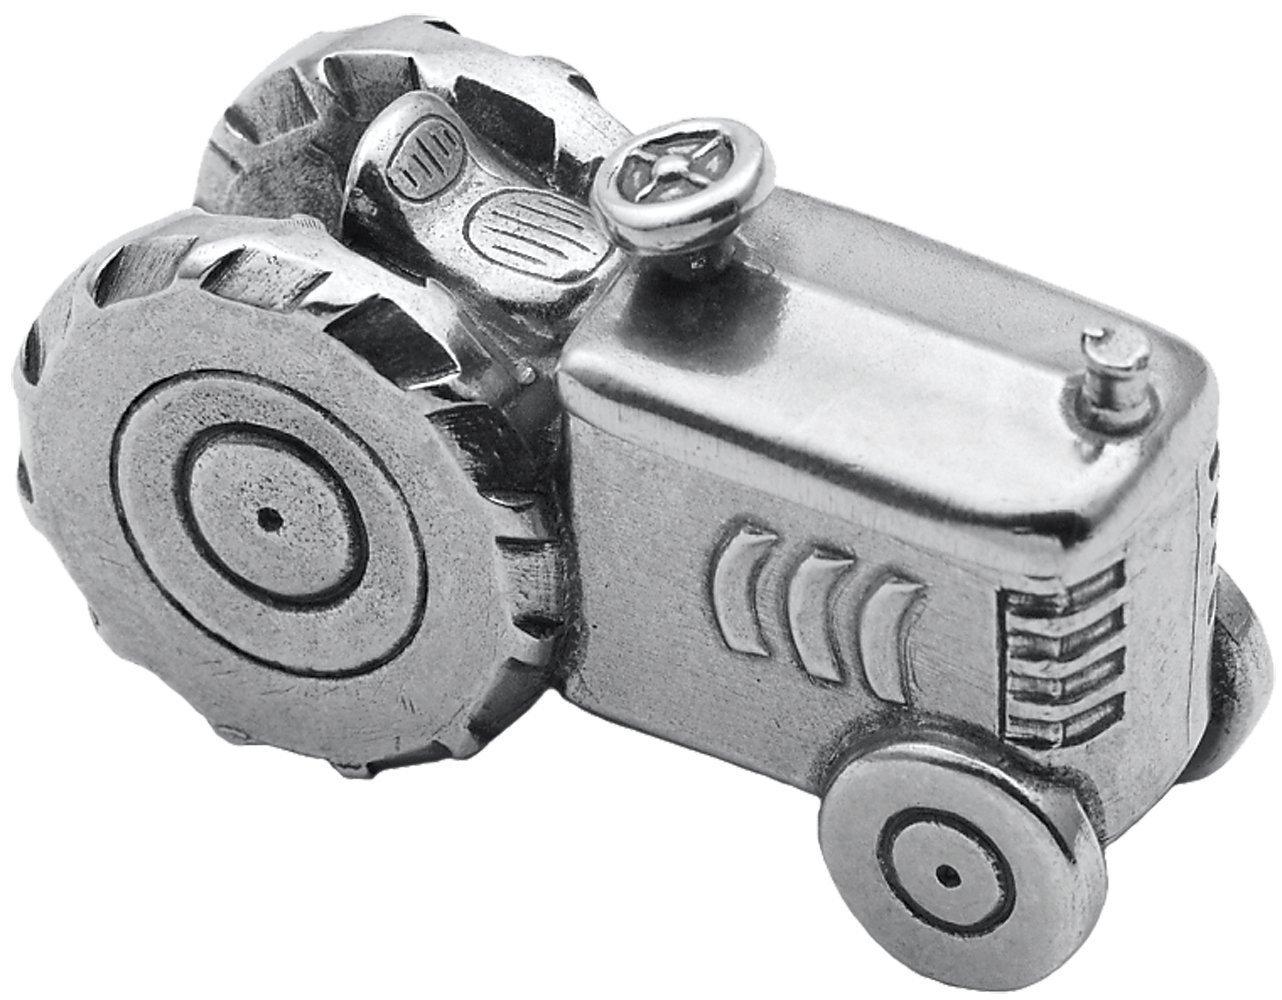 Danforth - トラクターピューター製つまようじ用ボックス - 手作り - ギフトボックス入り - アメリカ製   B0039OILTG